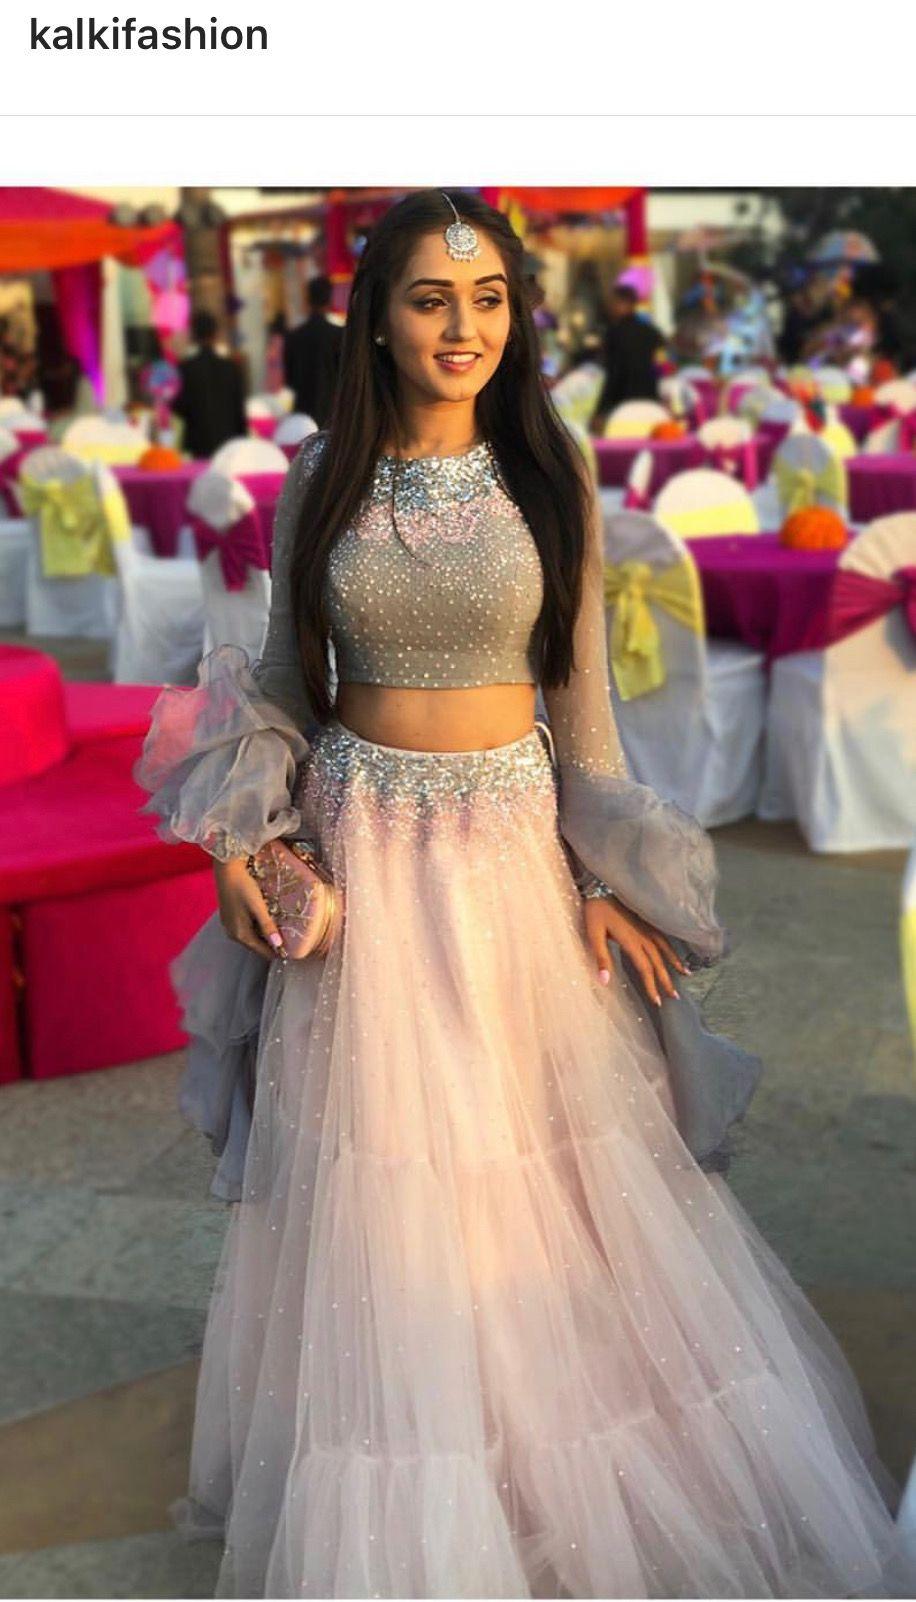 Pin By Gul Afsha On Wedding Saree Blouse Lehenga Inspiration Lehnga Dress Indian Gowns Dresses Designer Dresses Indian